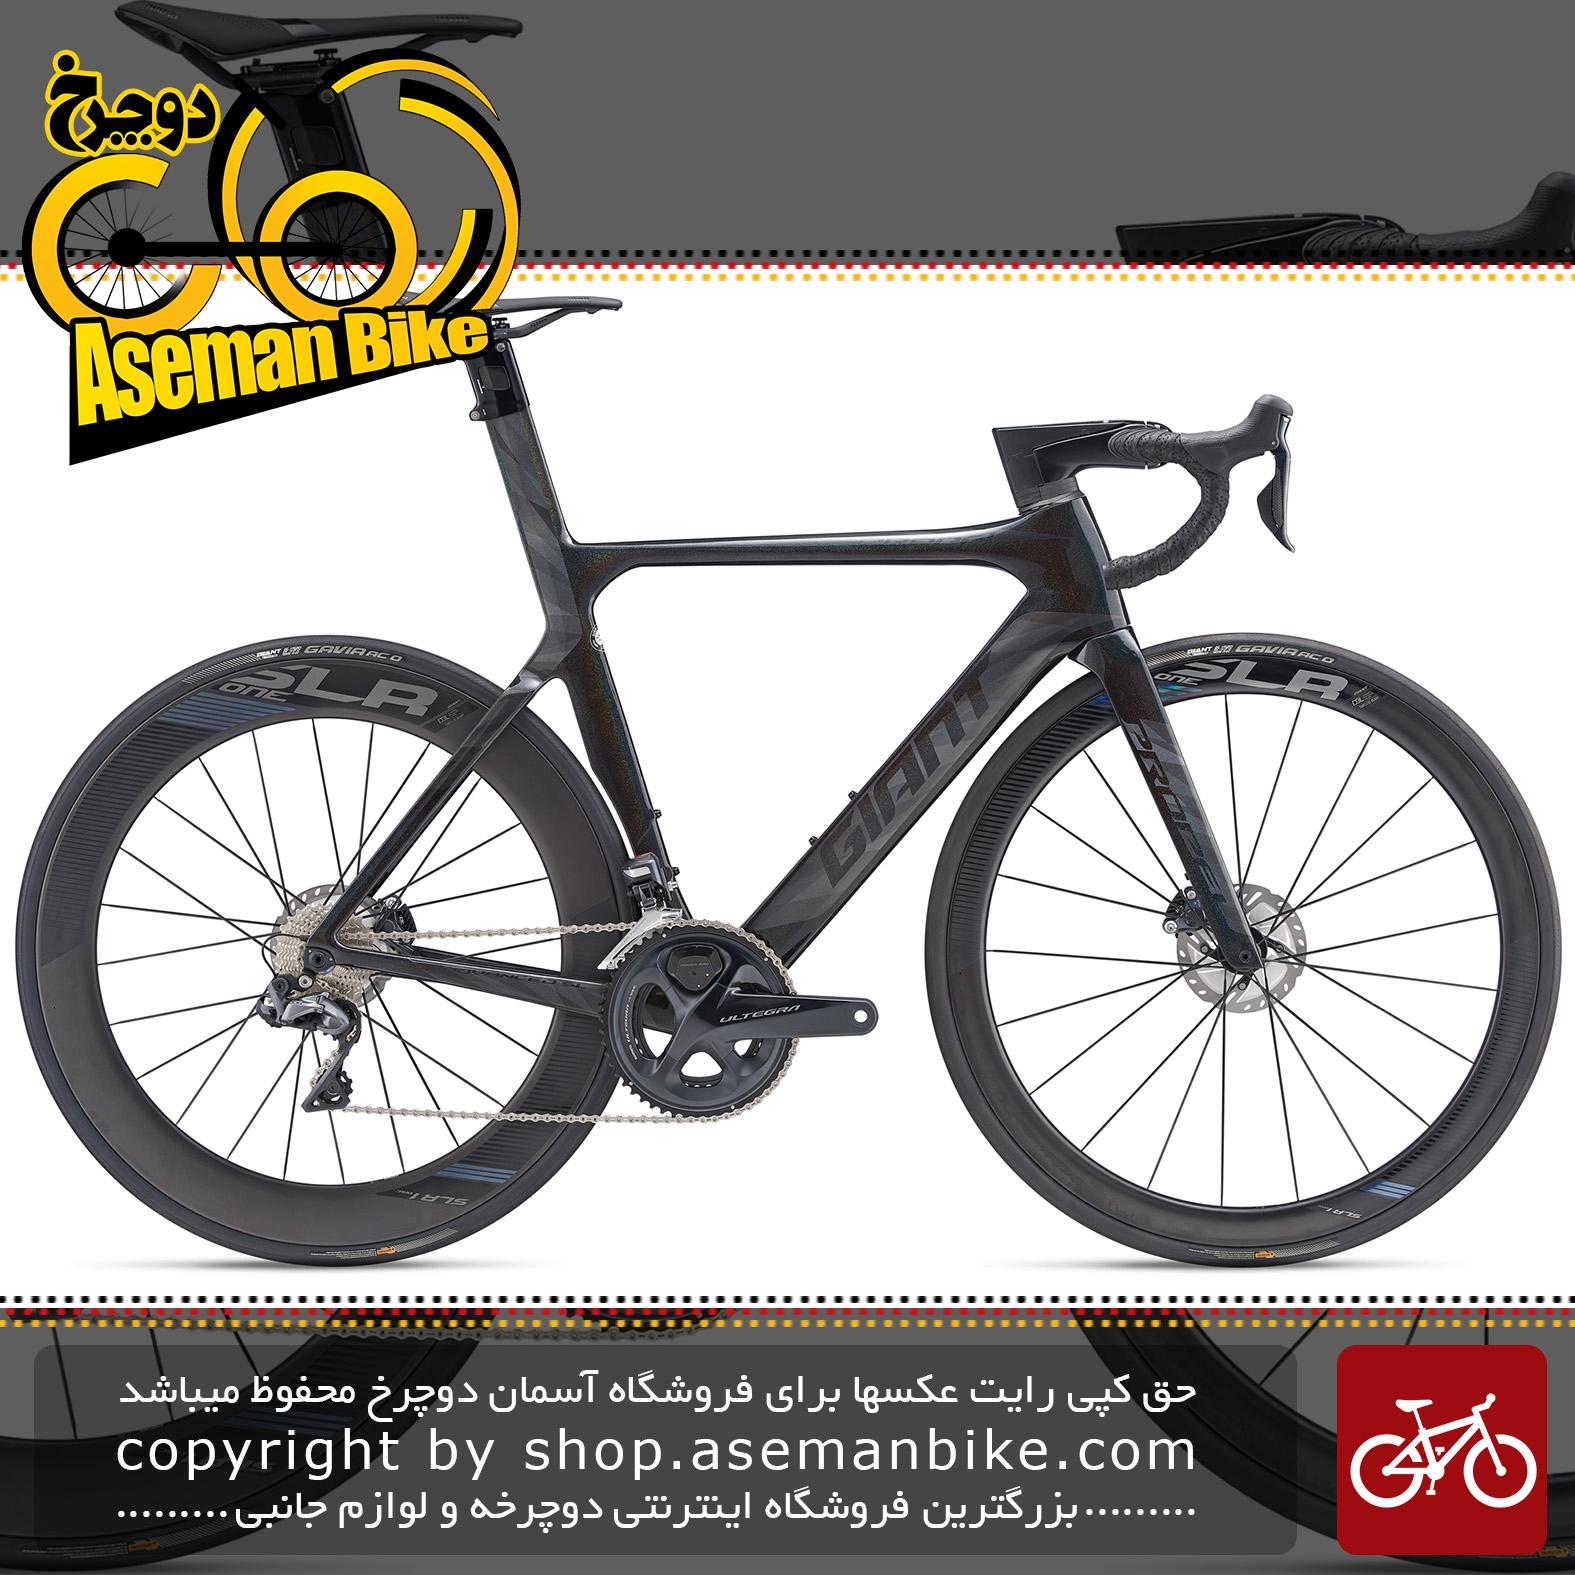 دوچرخه کوهستان کراس کانتری مسابقات کربن جاینت مدل ایکس تی ادونس اس ال 0 سایز 27.5 Giant XtC Advanced SL 0 2016